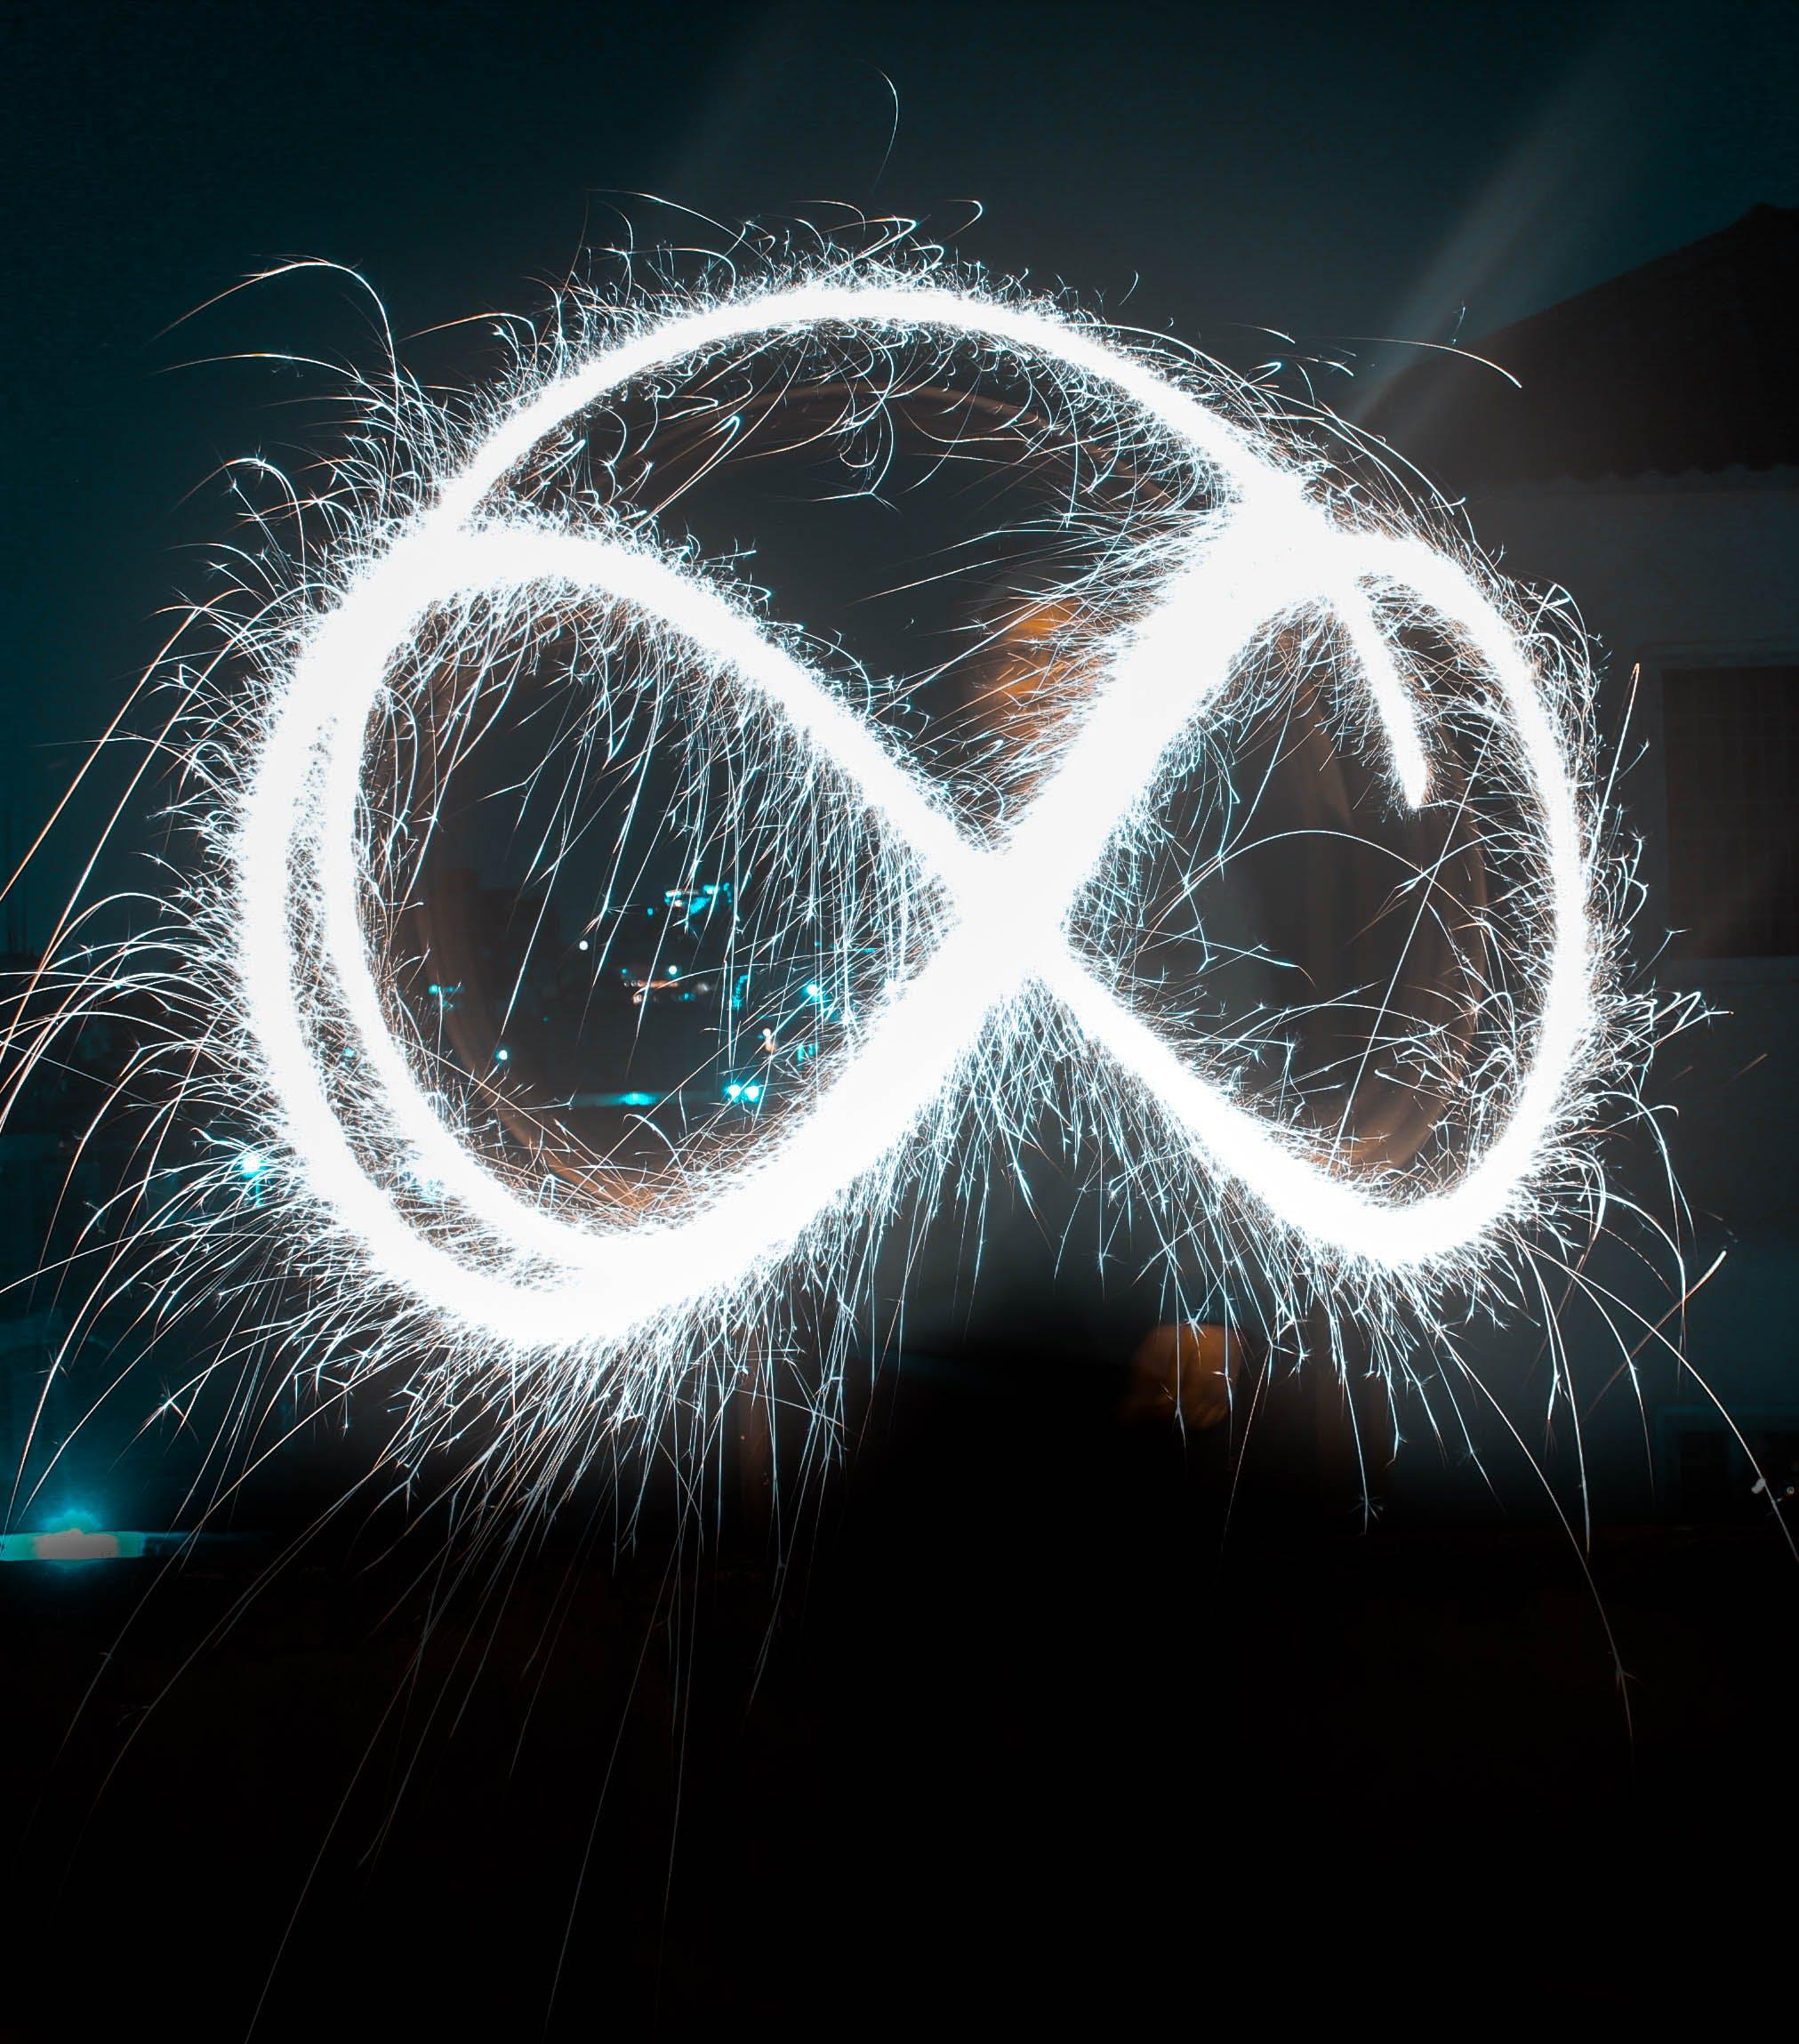 Free stock photo of beautiful, festival, festive, fireworks